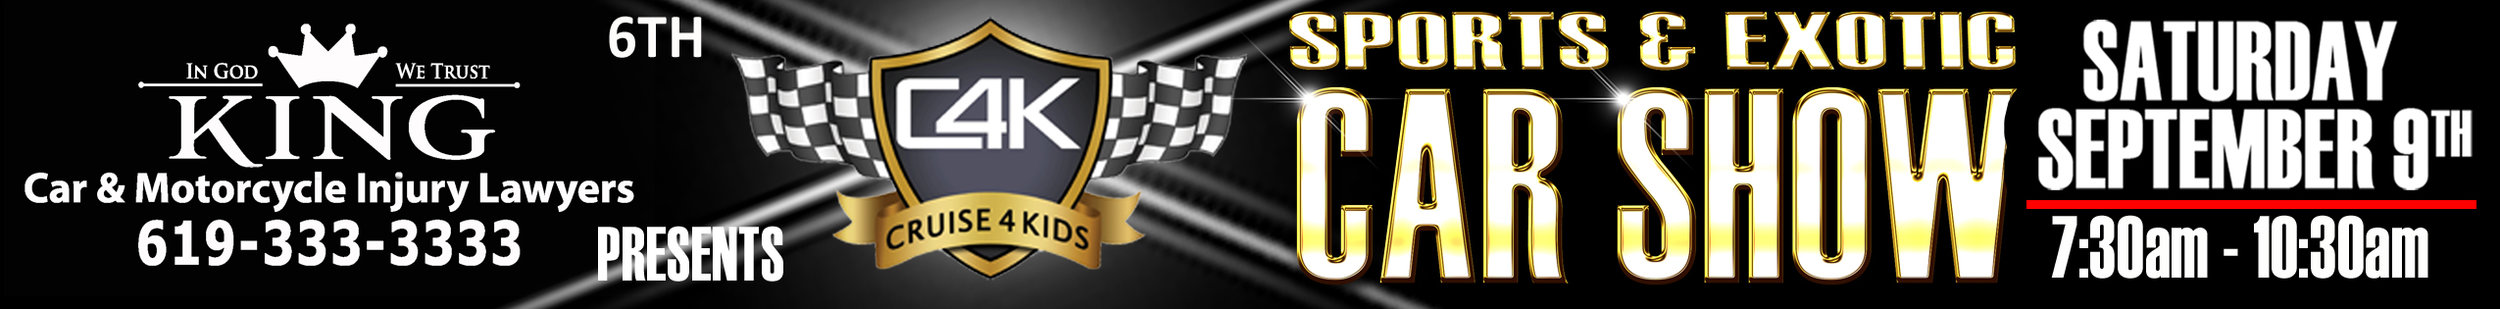 C4K sports & exotic car show